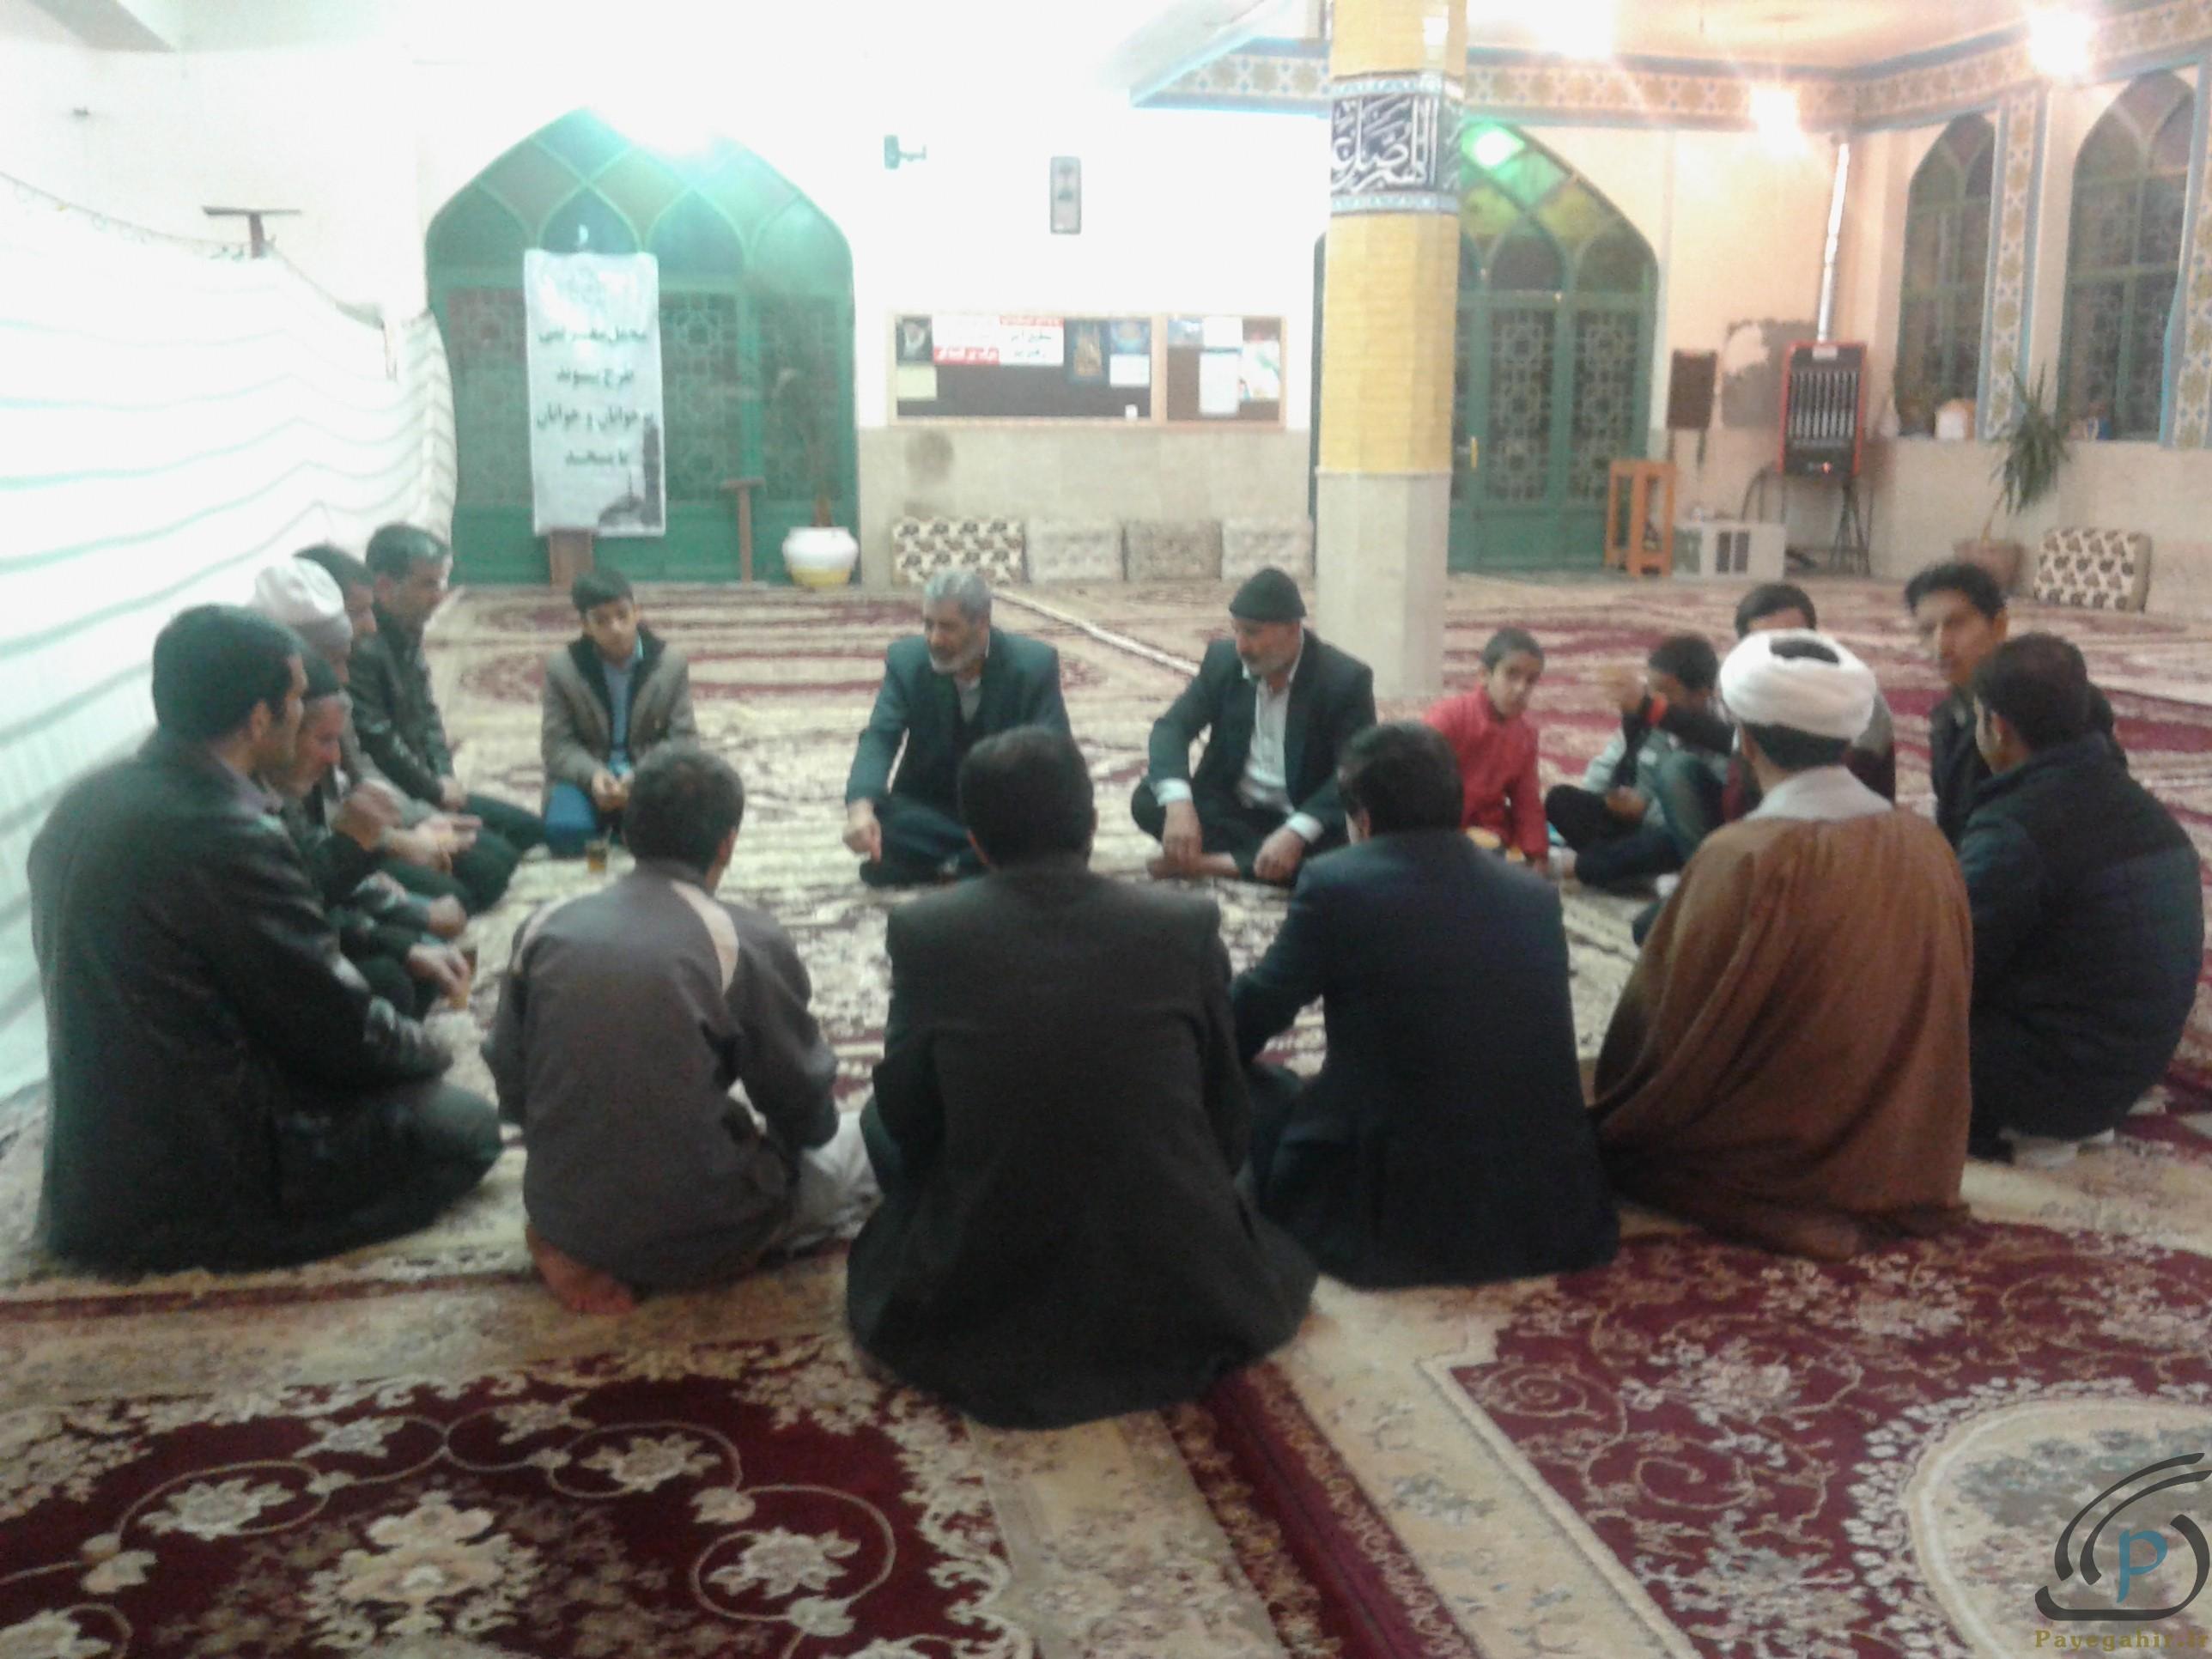 مسجد امام حسن وردنجان